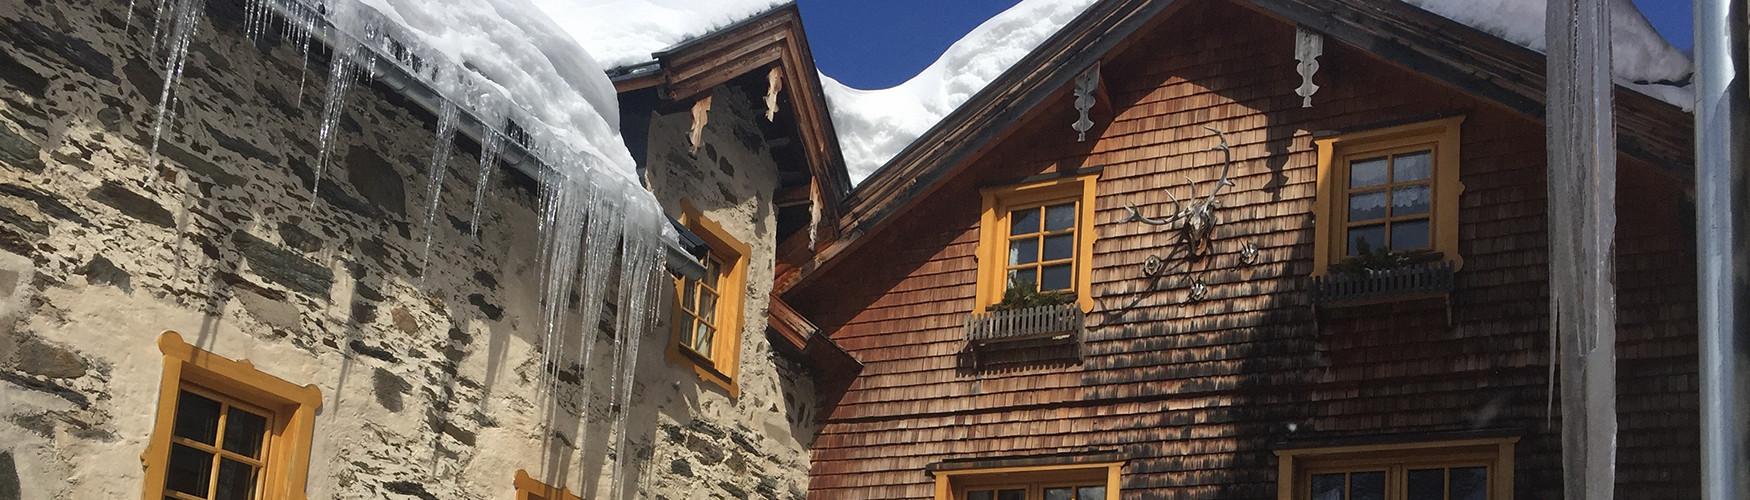 Skitouren Kurs, Skitour, Freeride